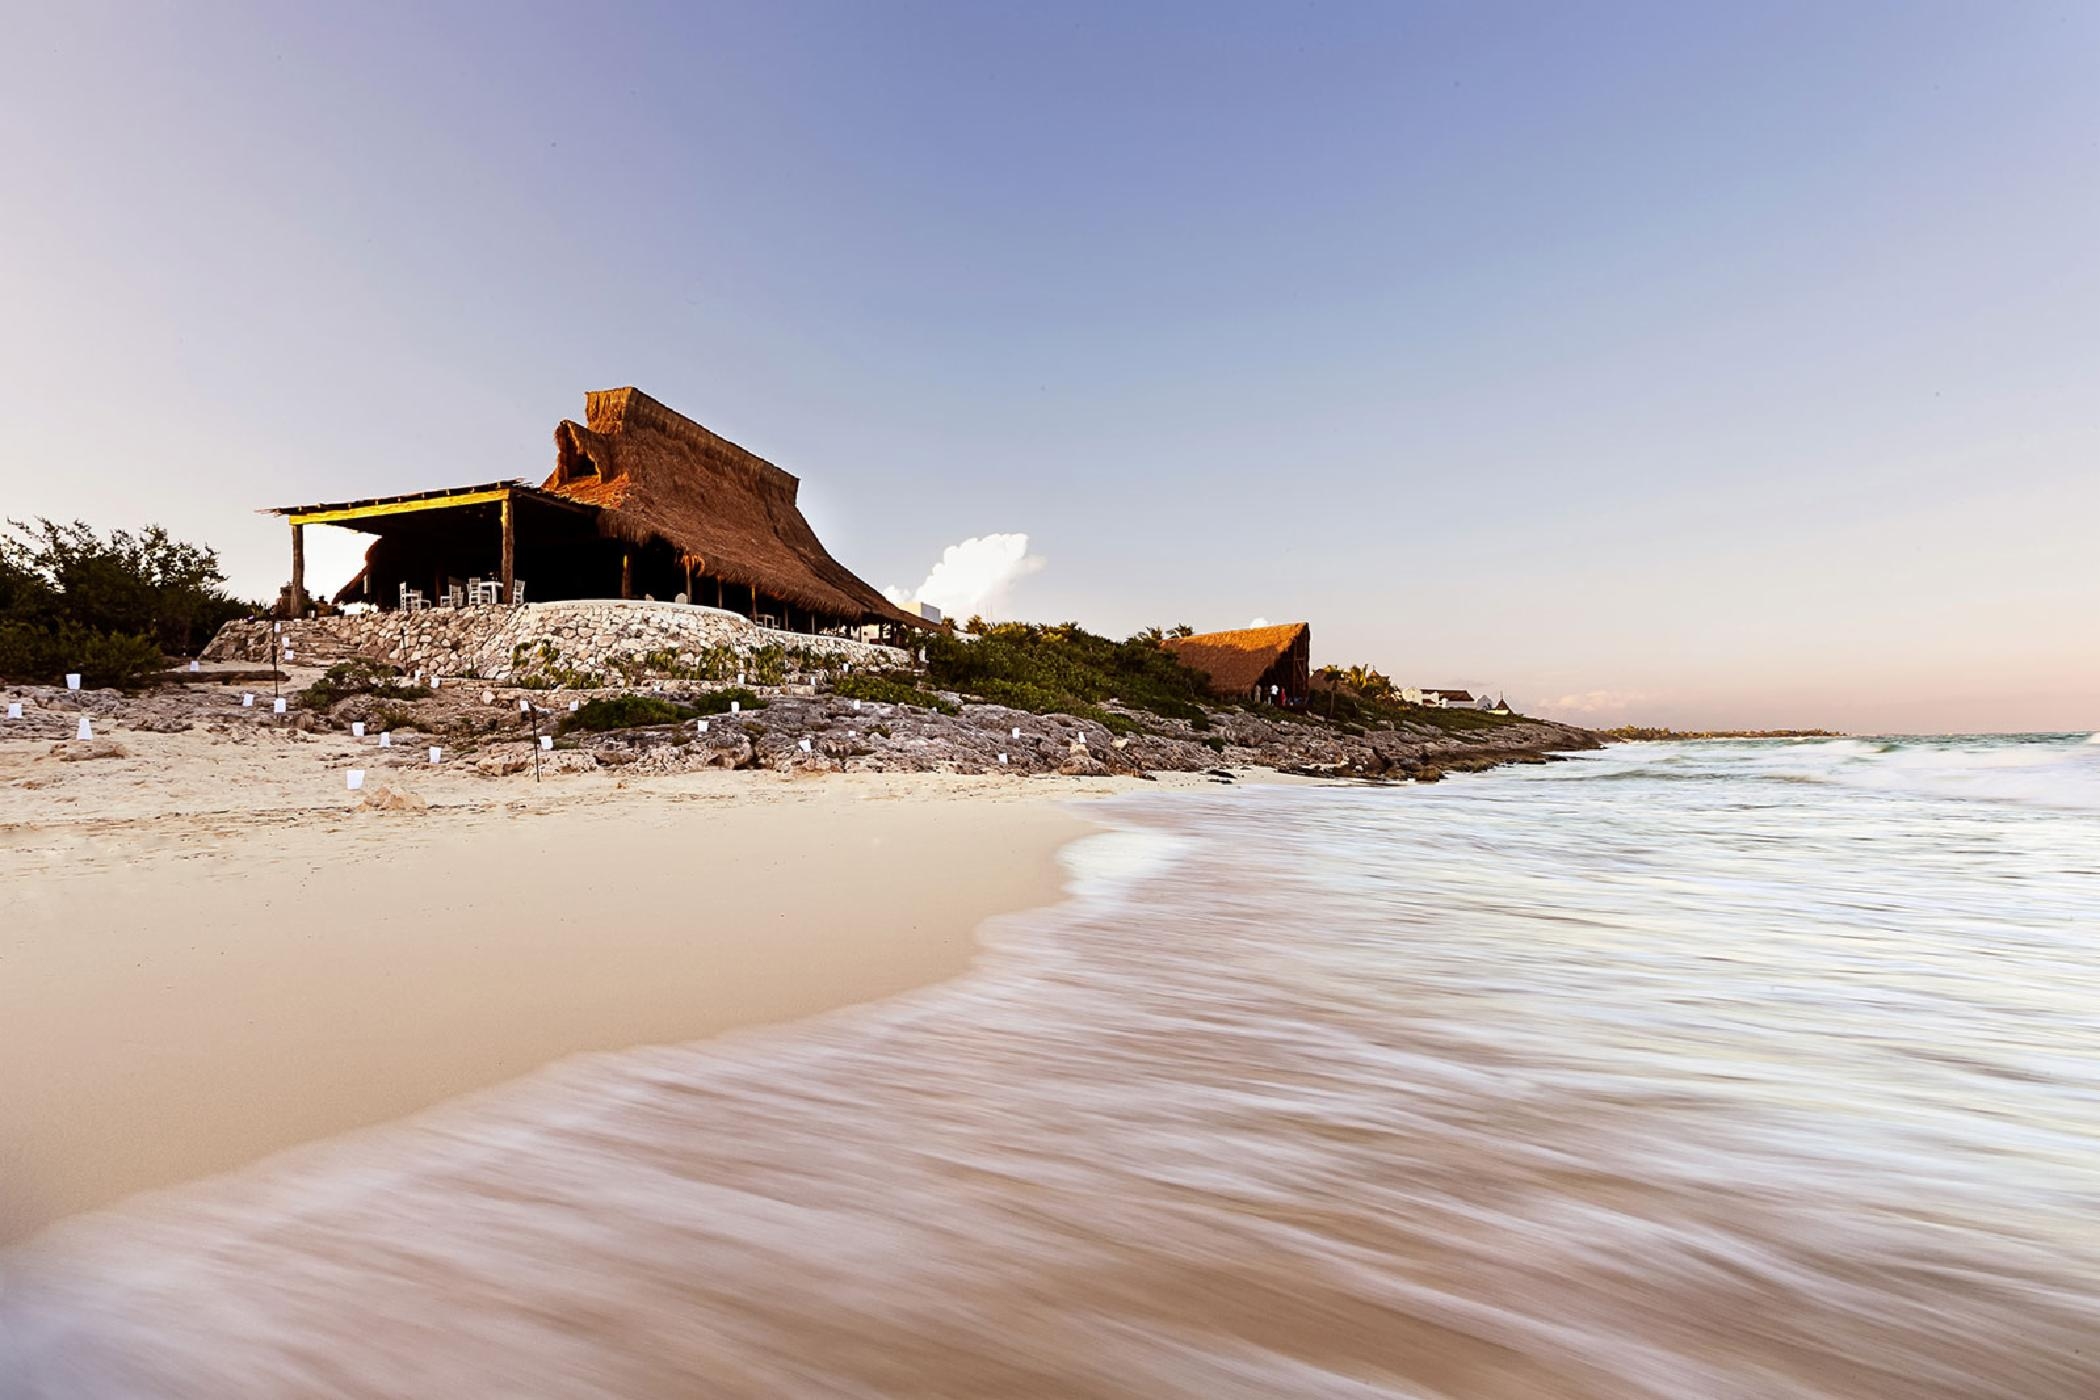 Maya_Luxe_Riviera_Maya_Luxury_Villas_Experiences_Hotel_Zone_Tulum_Beach_5_Bedrooms_Casa_Palapa_8.jpg